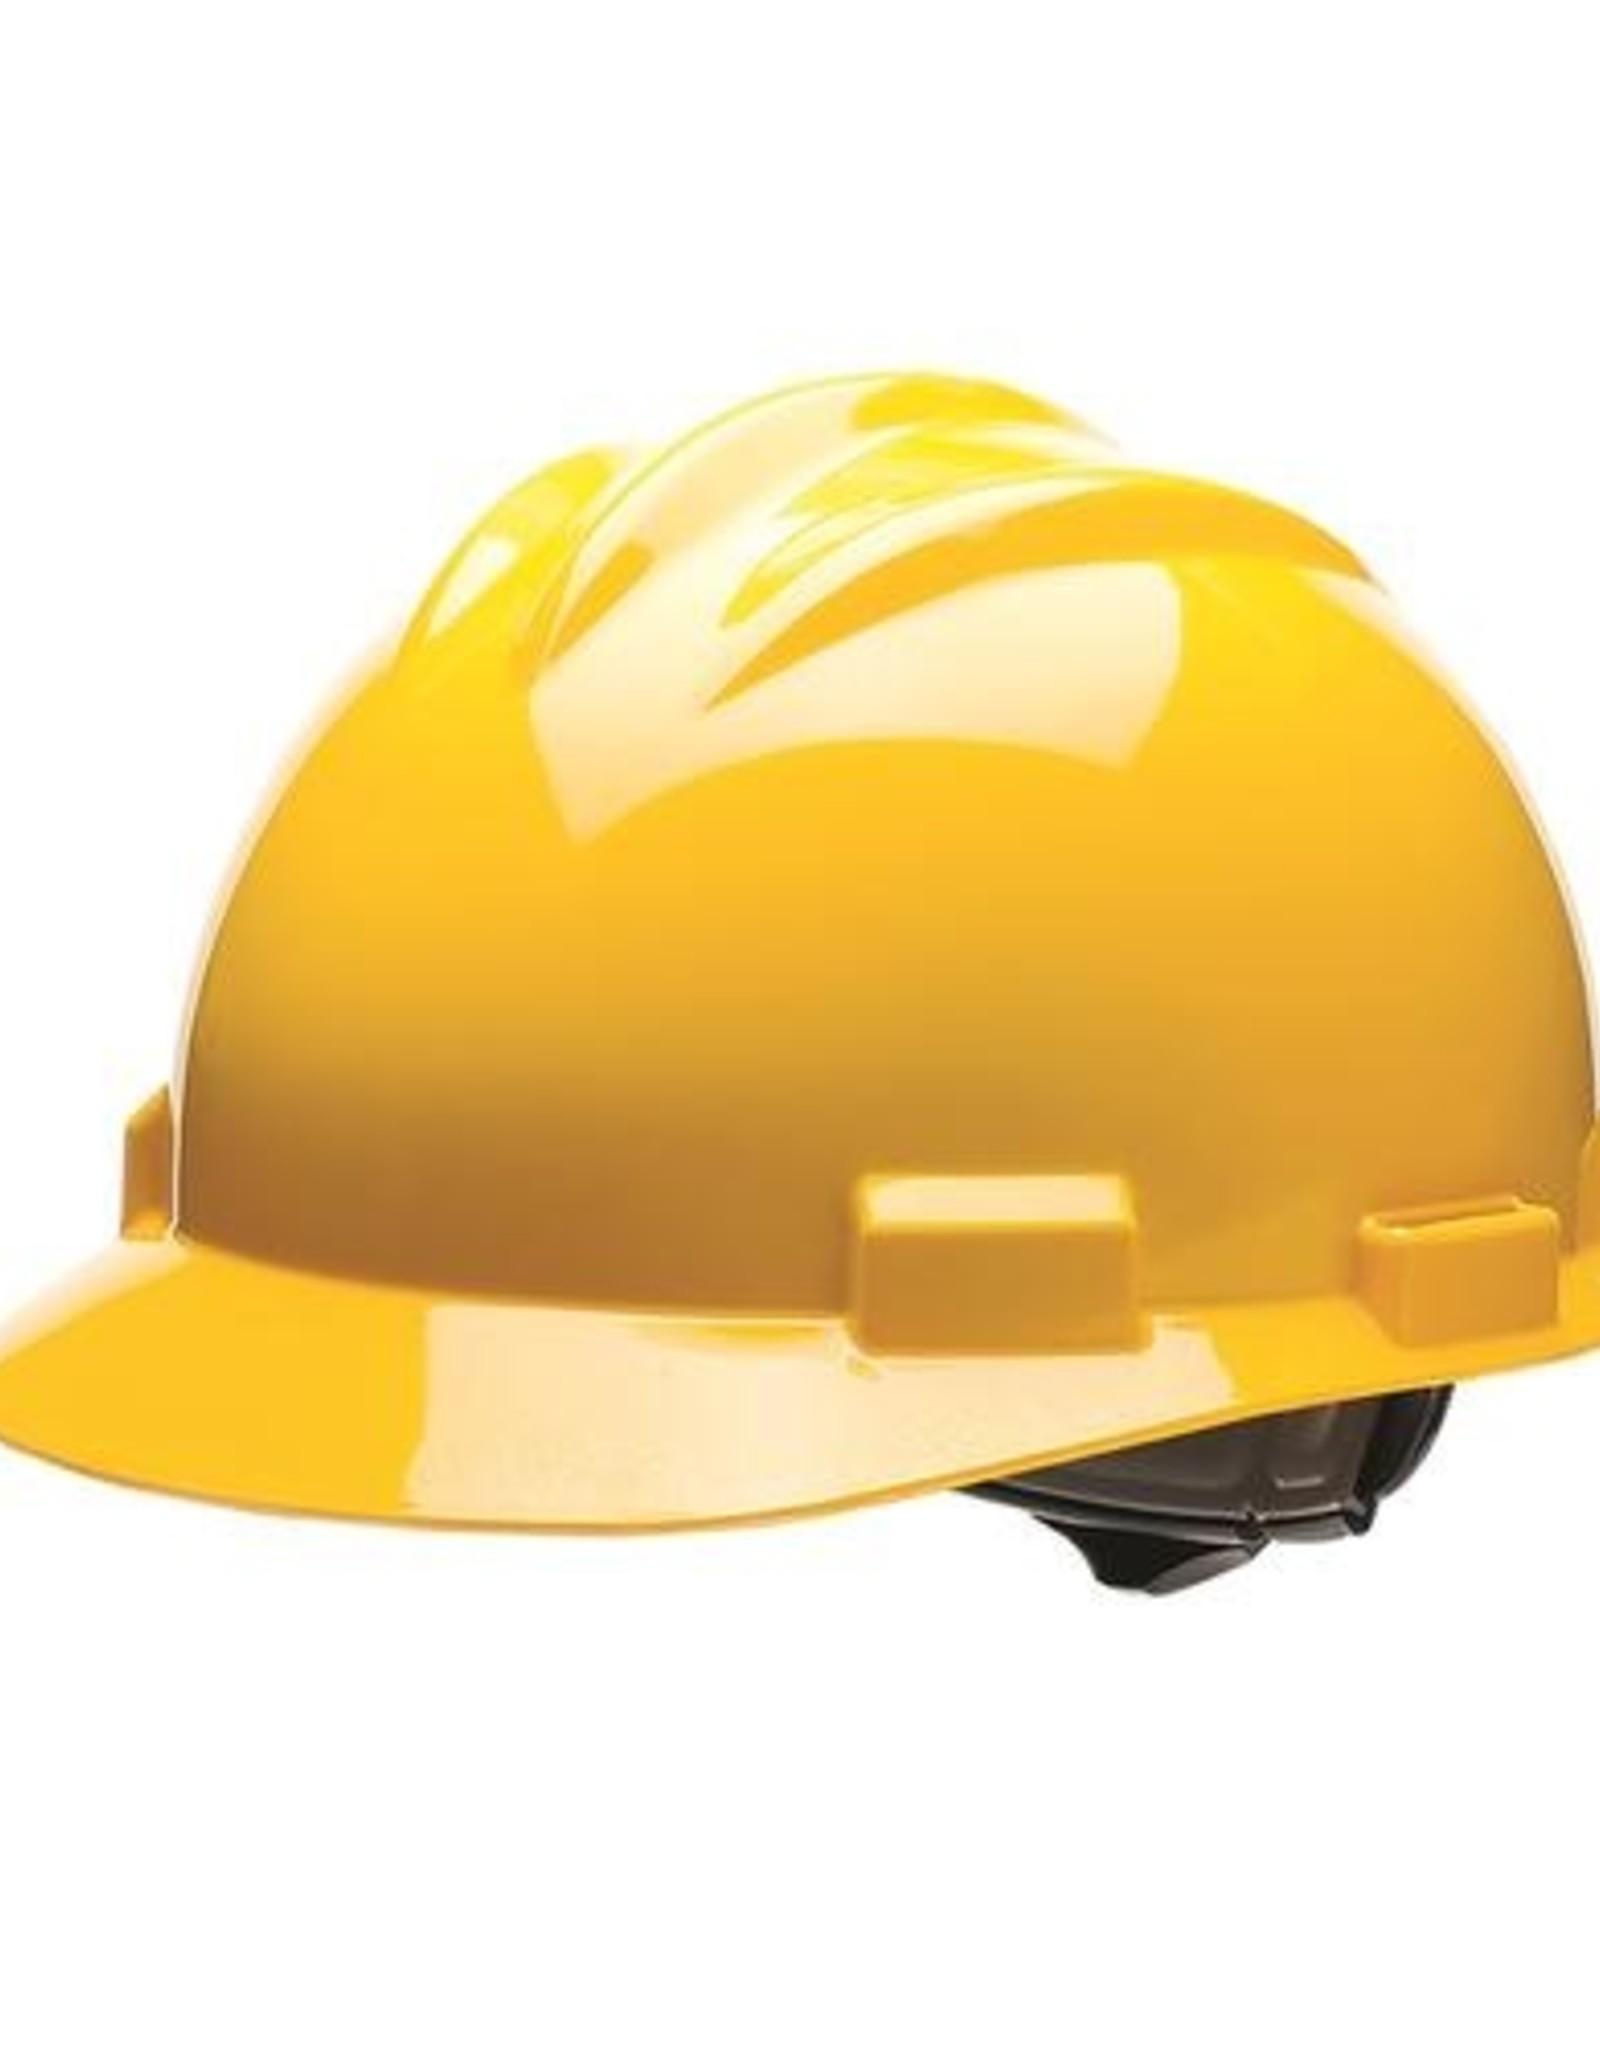 Standard Safety Helmet, Pin Lock Suspension, Yellow Shell